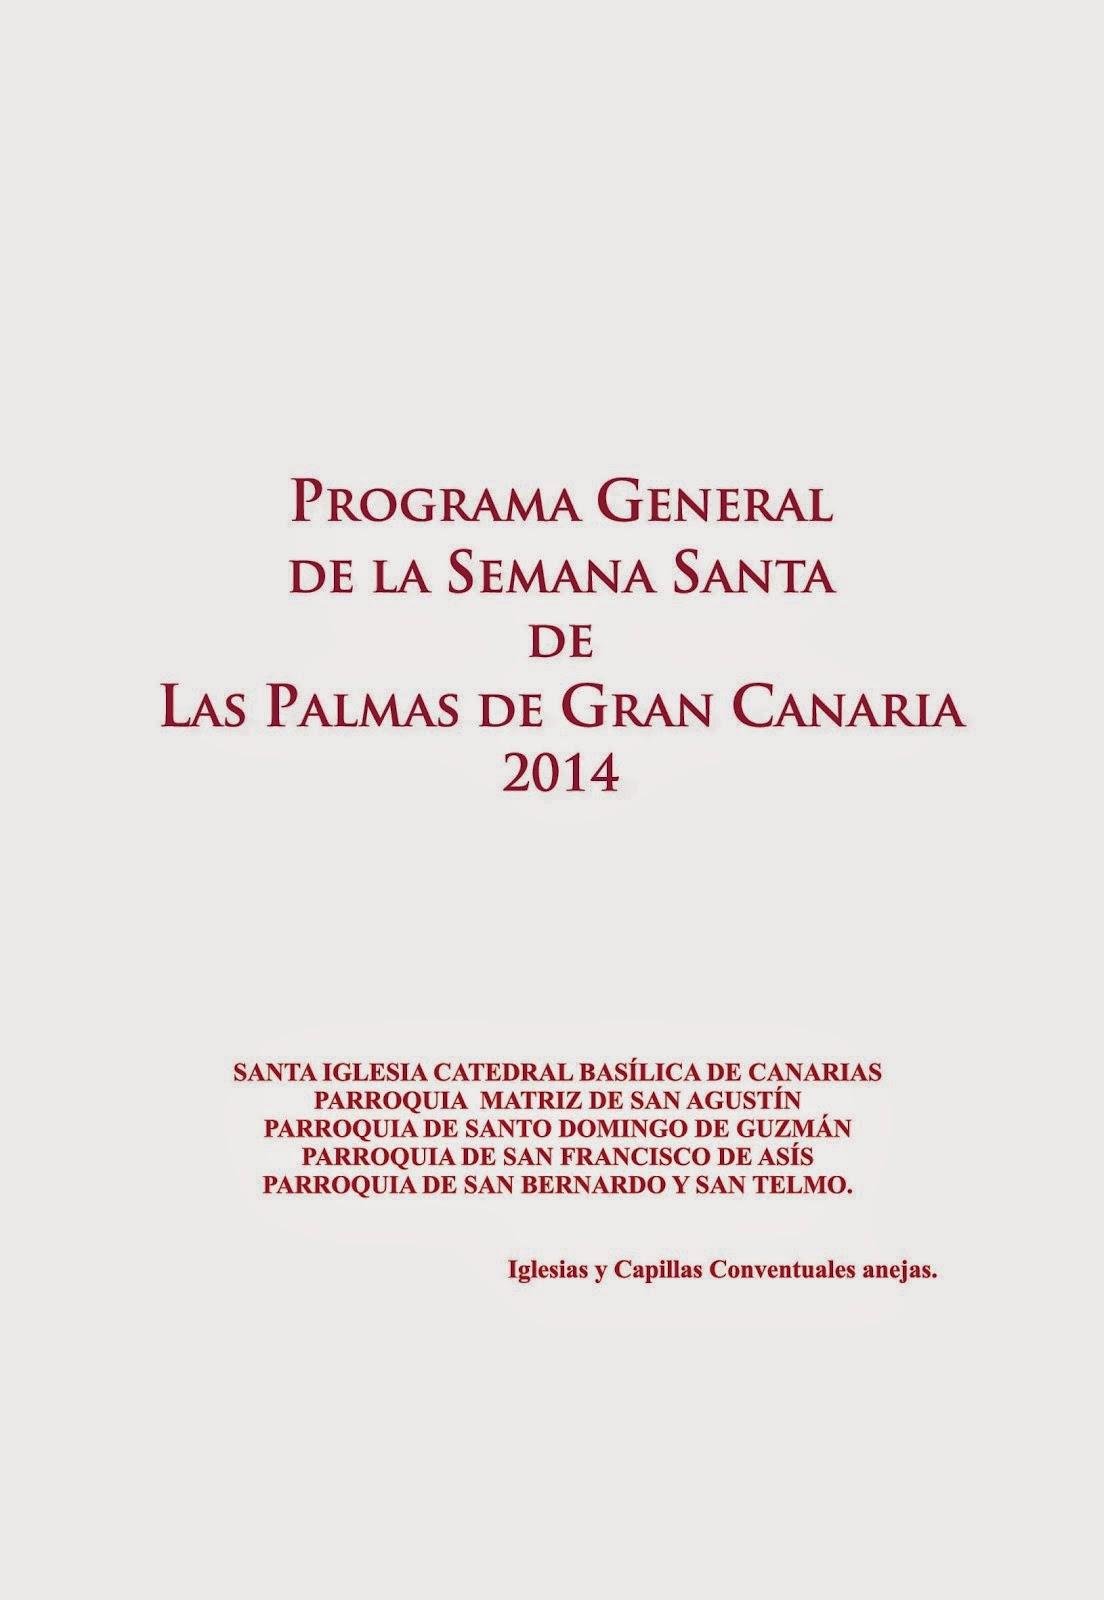 PROGRAMA SEMANA SANTA 2014